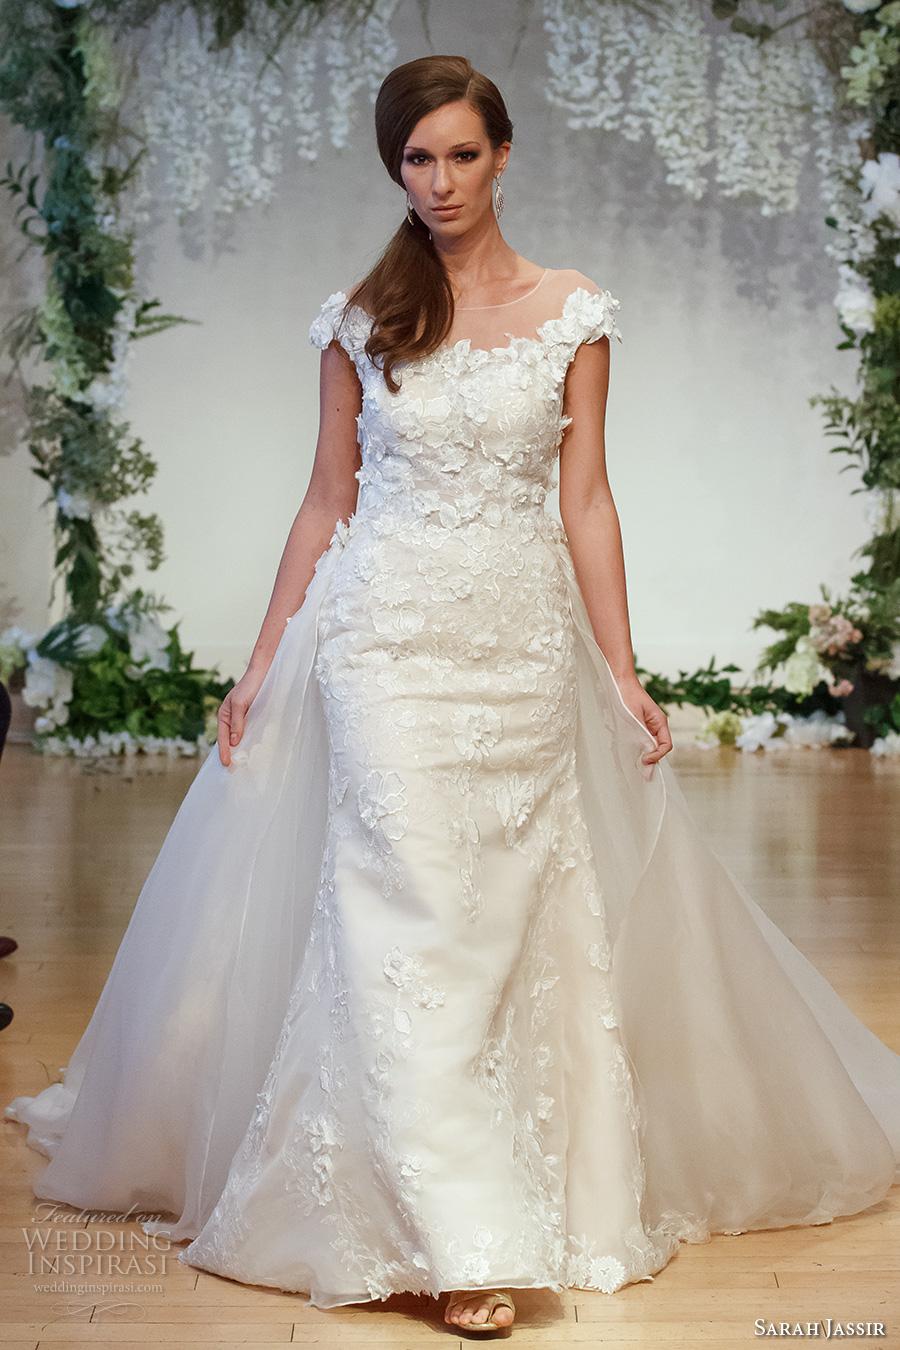 sarah jassir 2017 bridal cpa sleeves sheer boat neck scoop neckline heavily embellished bodice classic elegant trumpet wedding dress a  line overskirt sheer low back chapel train (8) mv